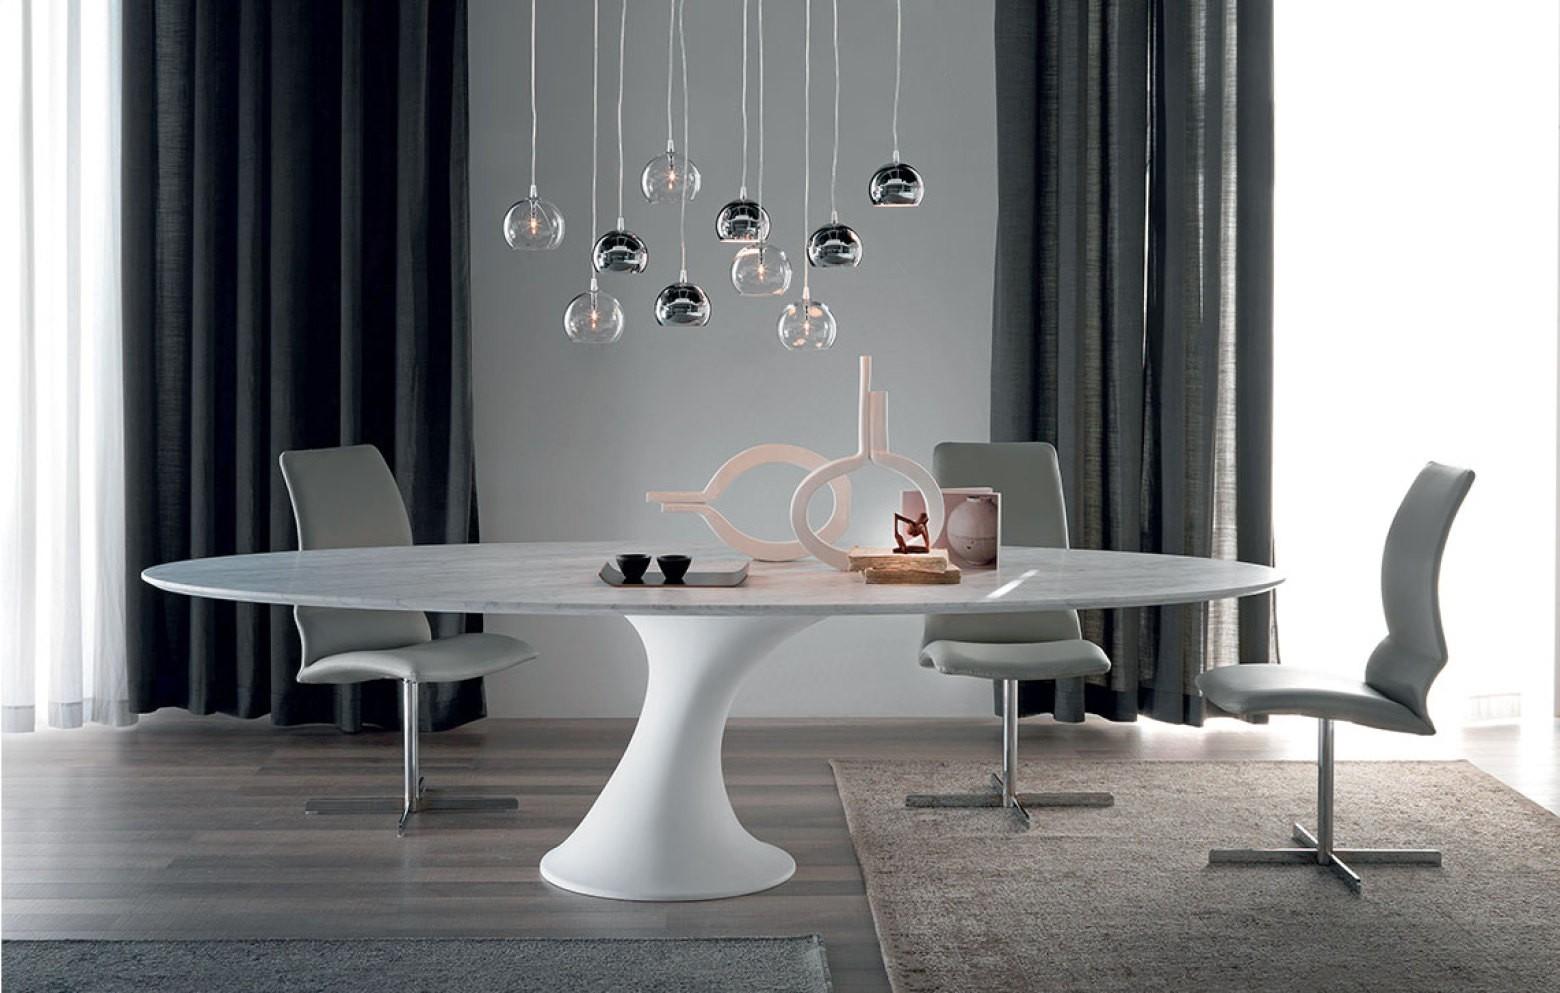 eclipse lampe lampen kleinm bel accessoires who 39 s. Black Bedroom Furniture Sets. Home Design Ideas